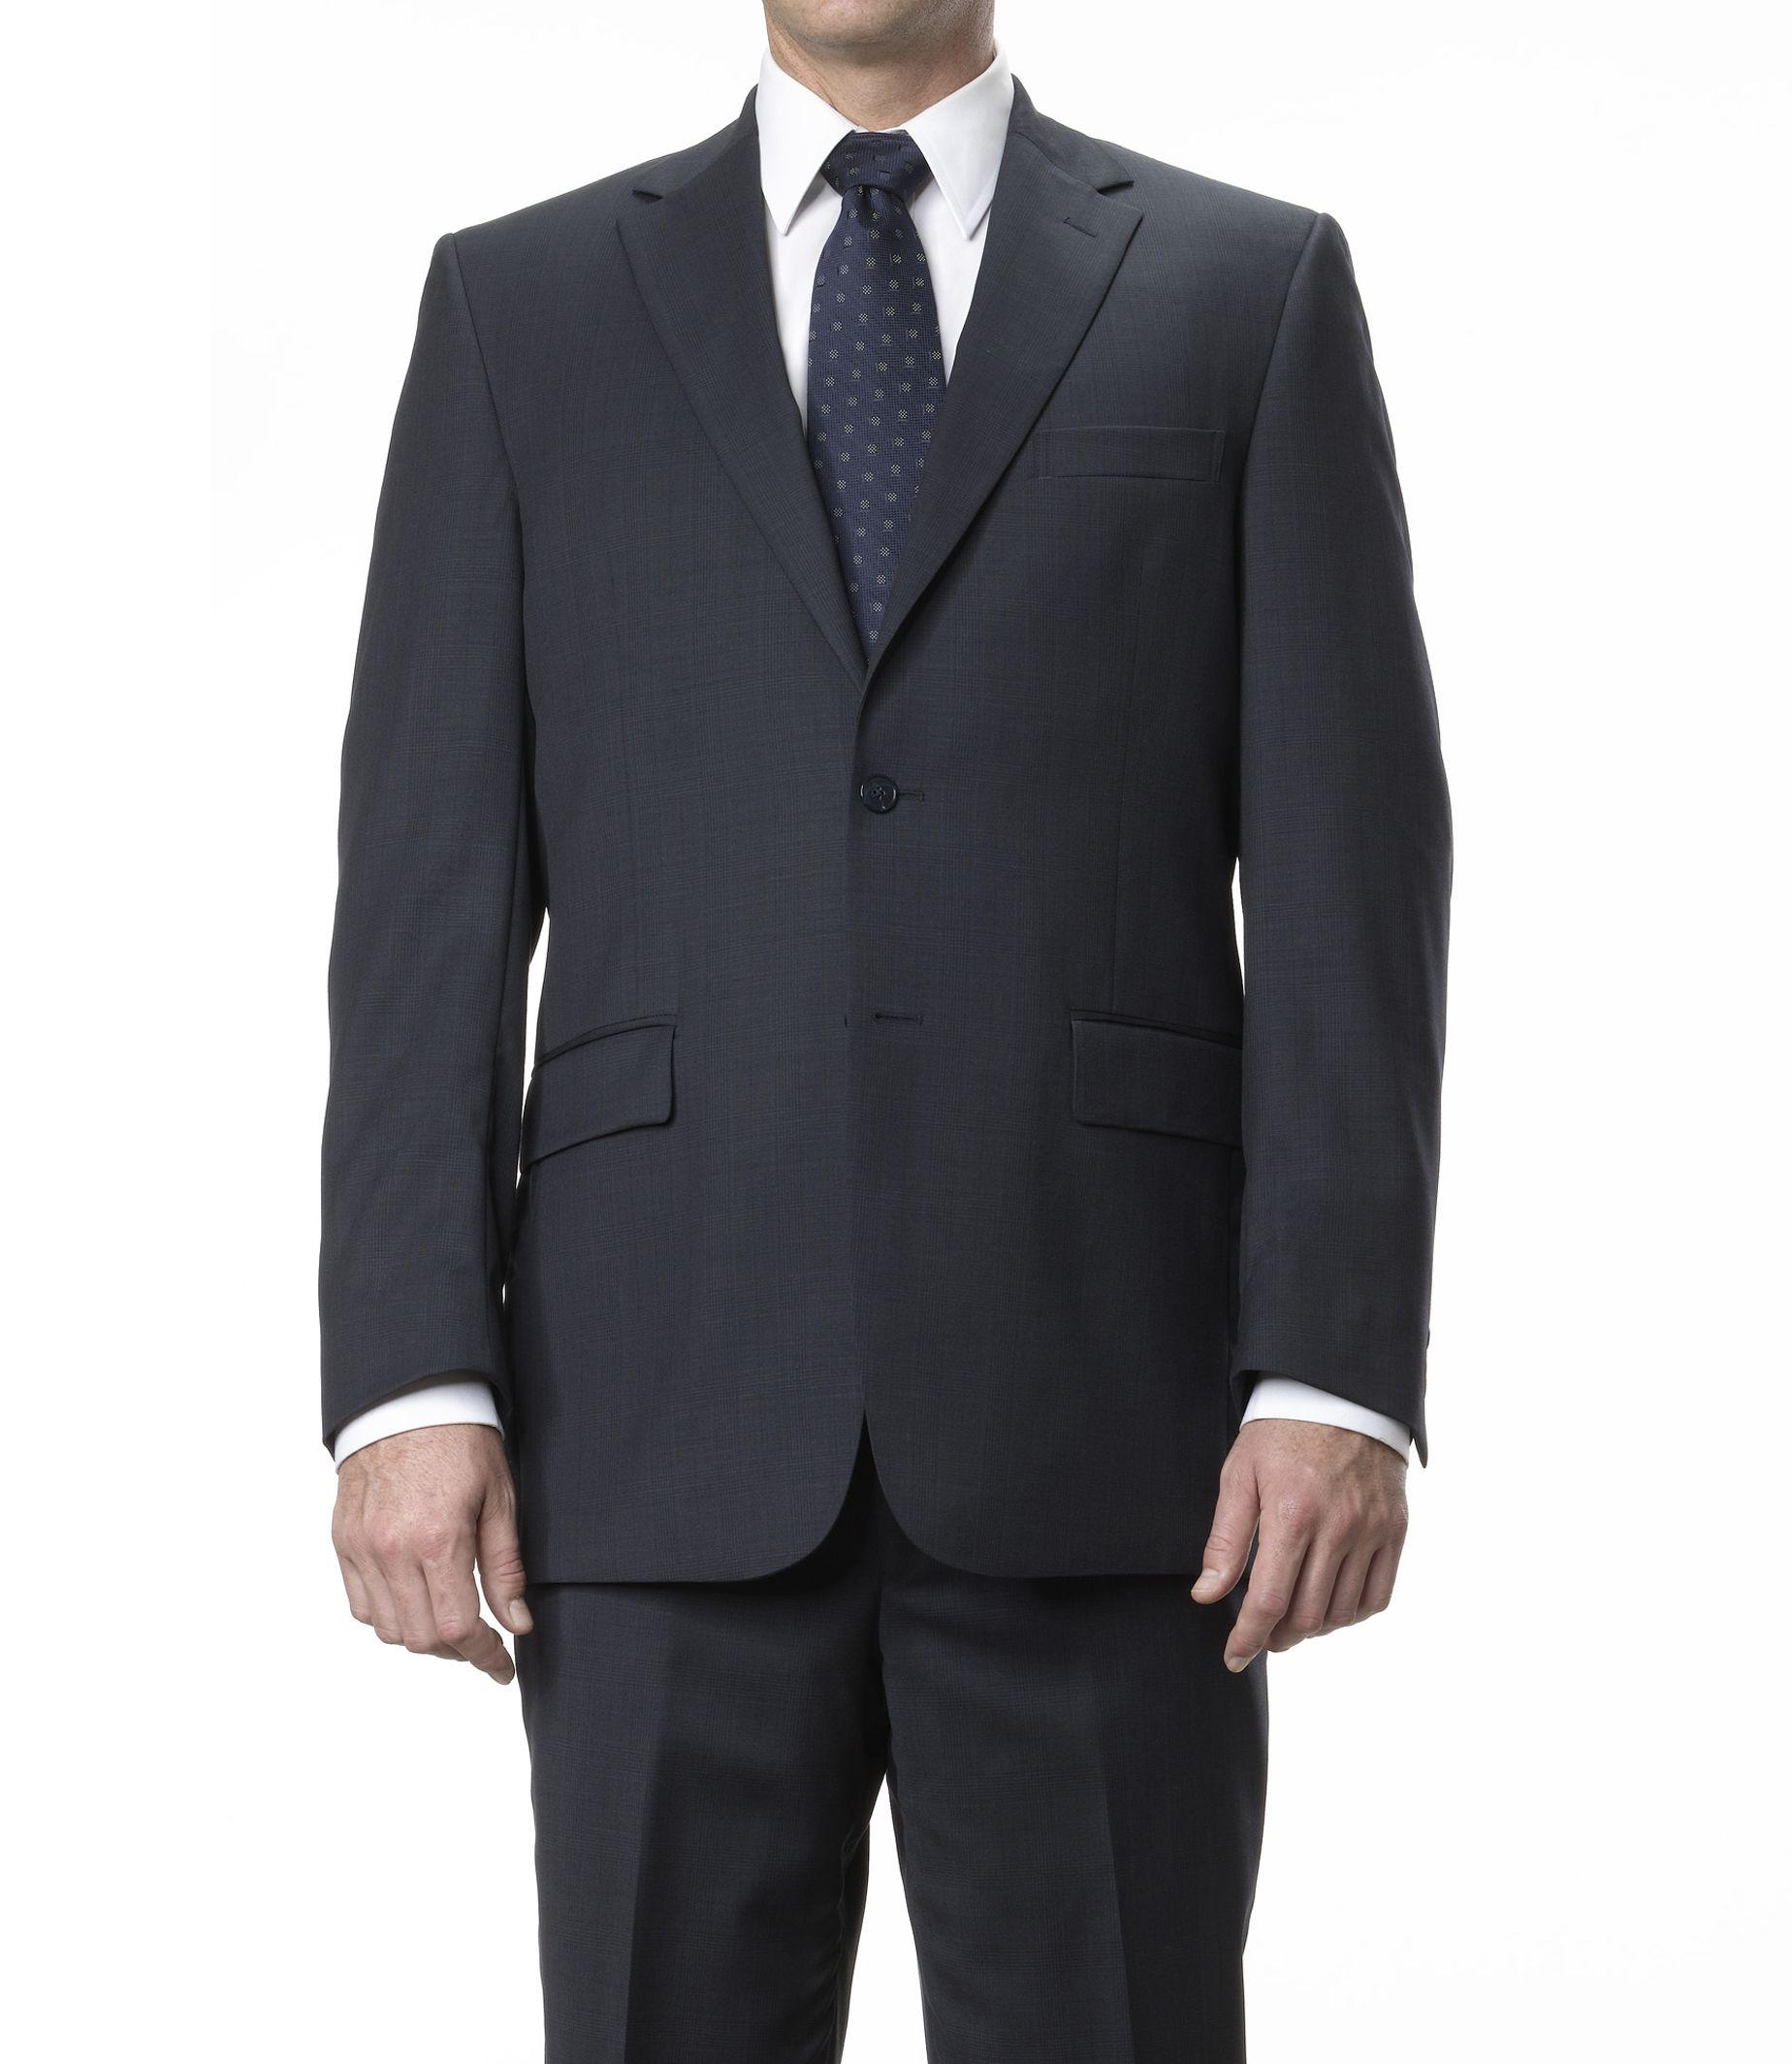 Traveler Tailored Fit 2-Button Suits Plain Front Trousers- Navy Plaid